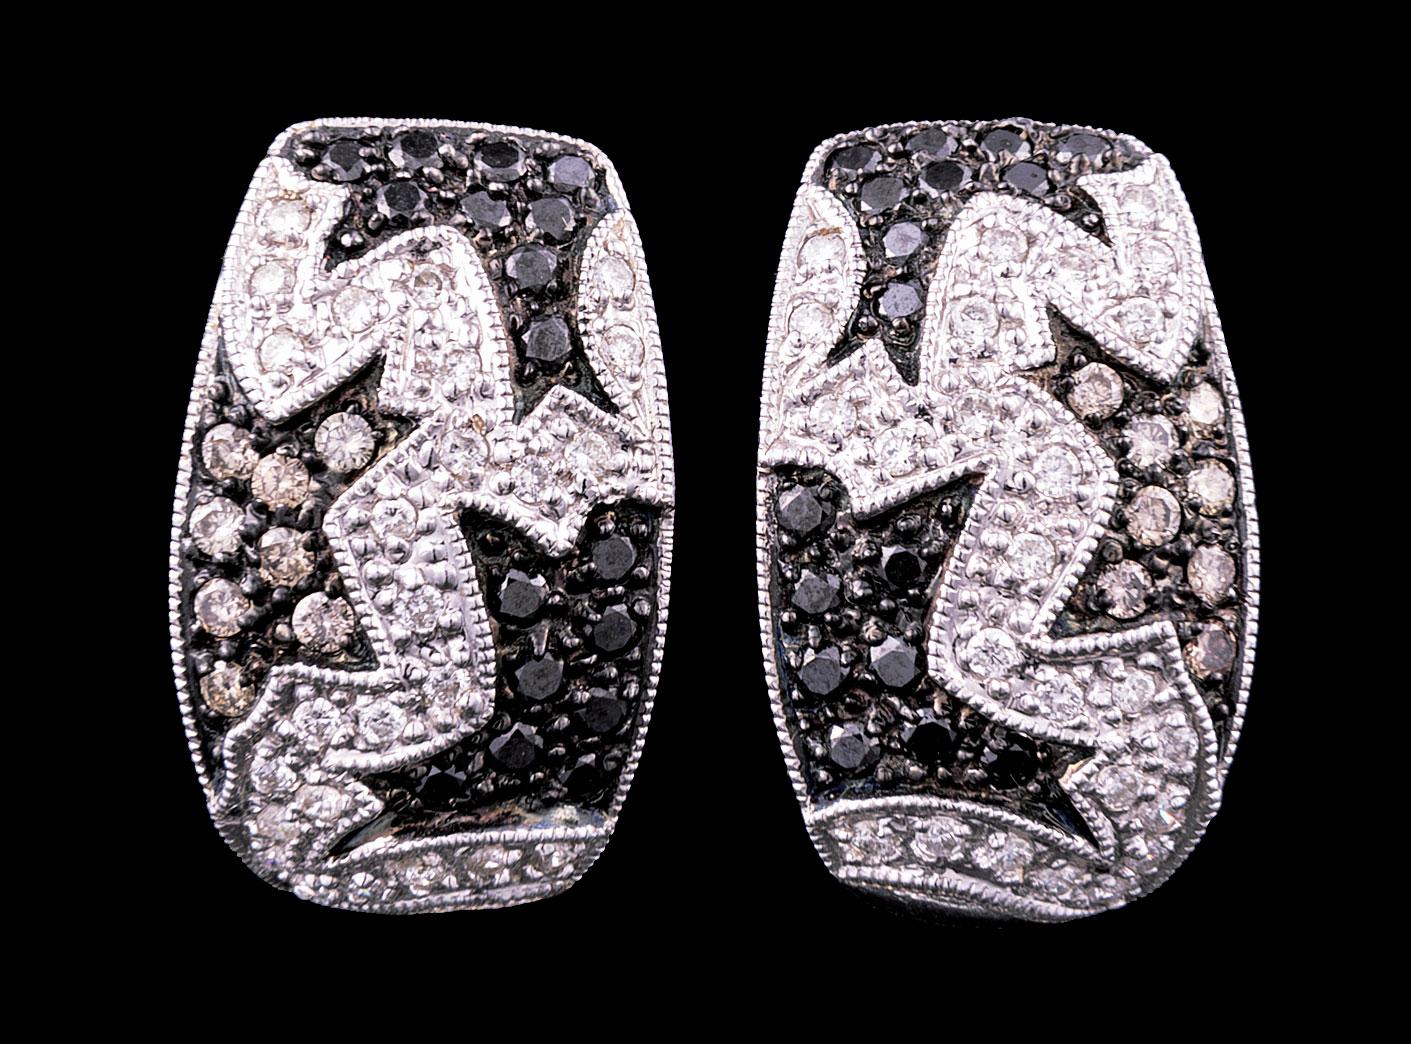 Lot 620 - Pair of 14 kt. White Gold, Diamond, Black Diamond, and Brown Diamond Earrings , 50 prong set round